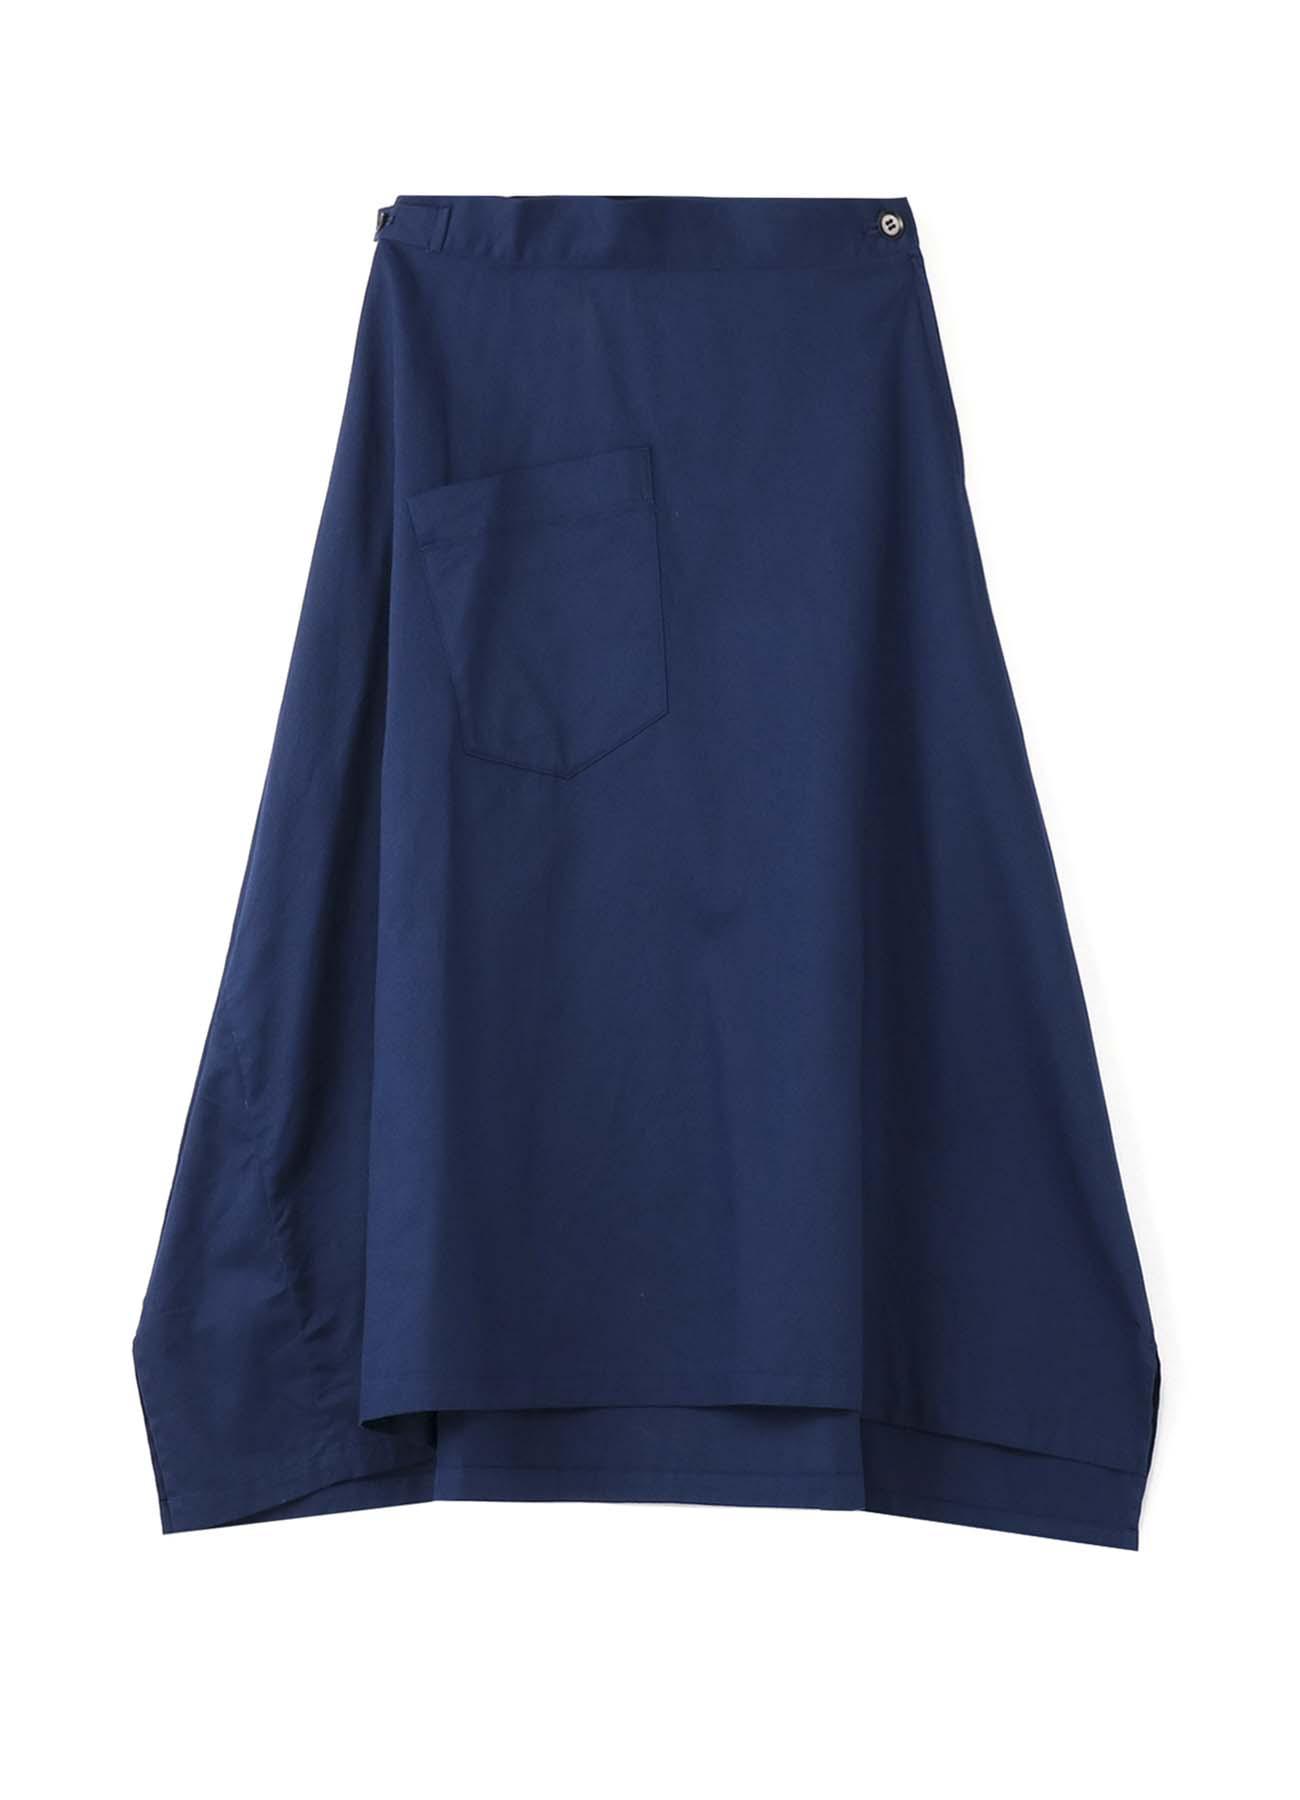 Y's-BORN PRODUCT ツイル 三角フレアスカート